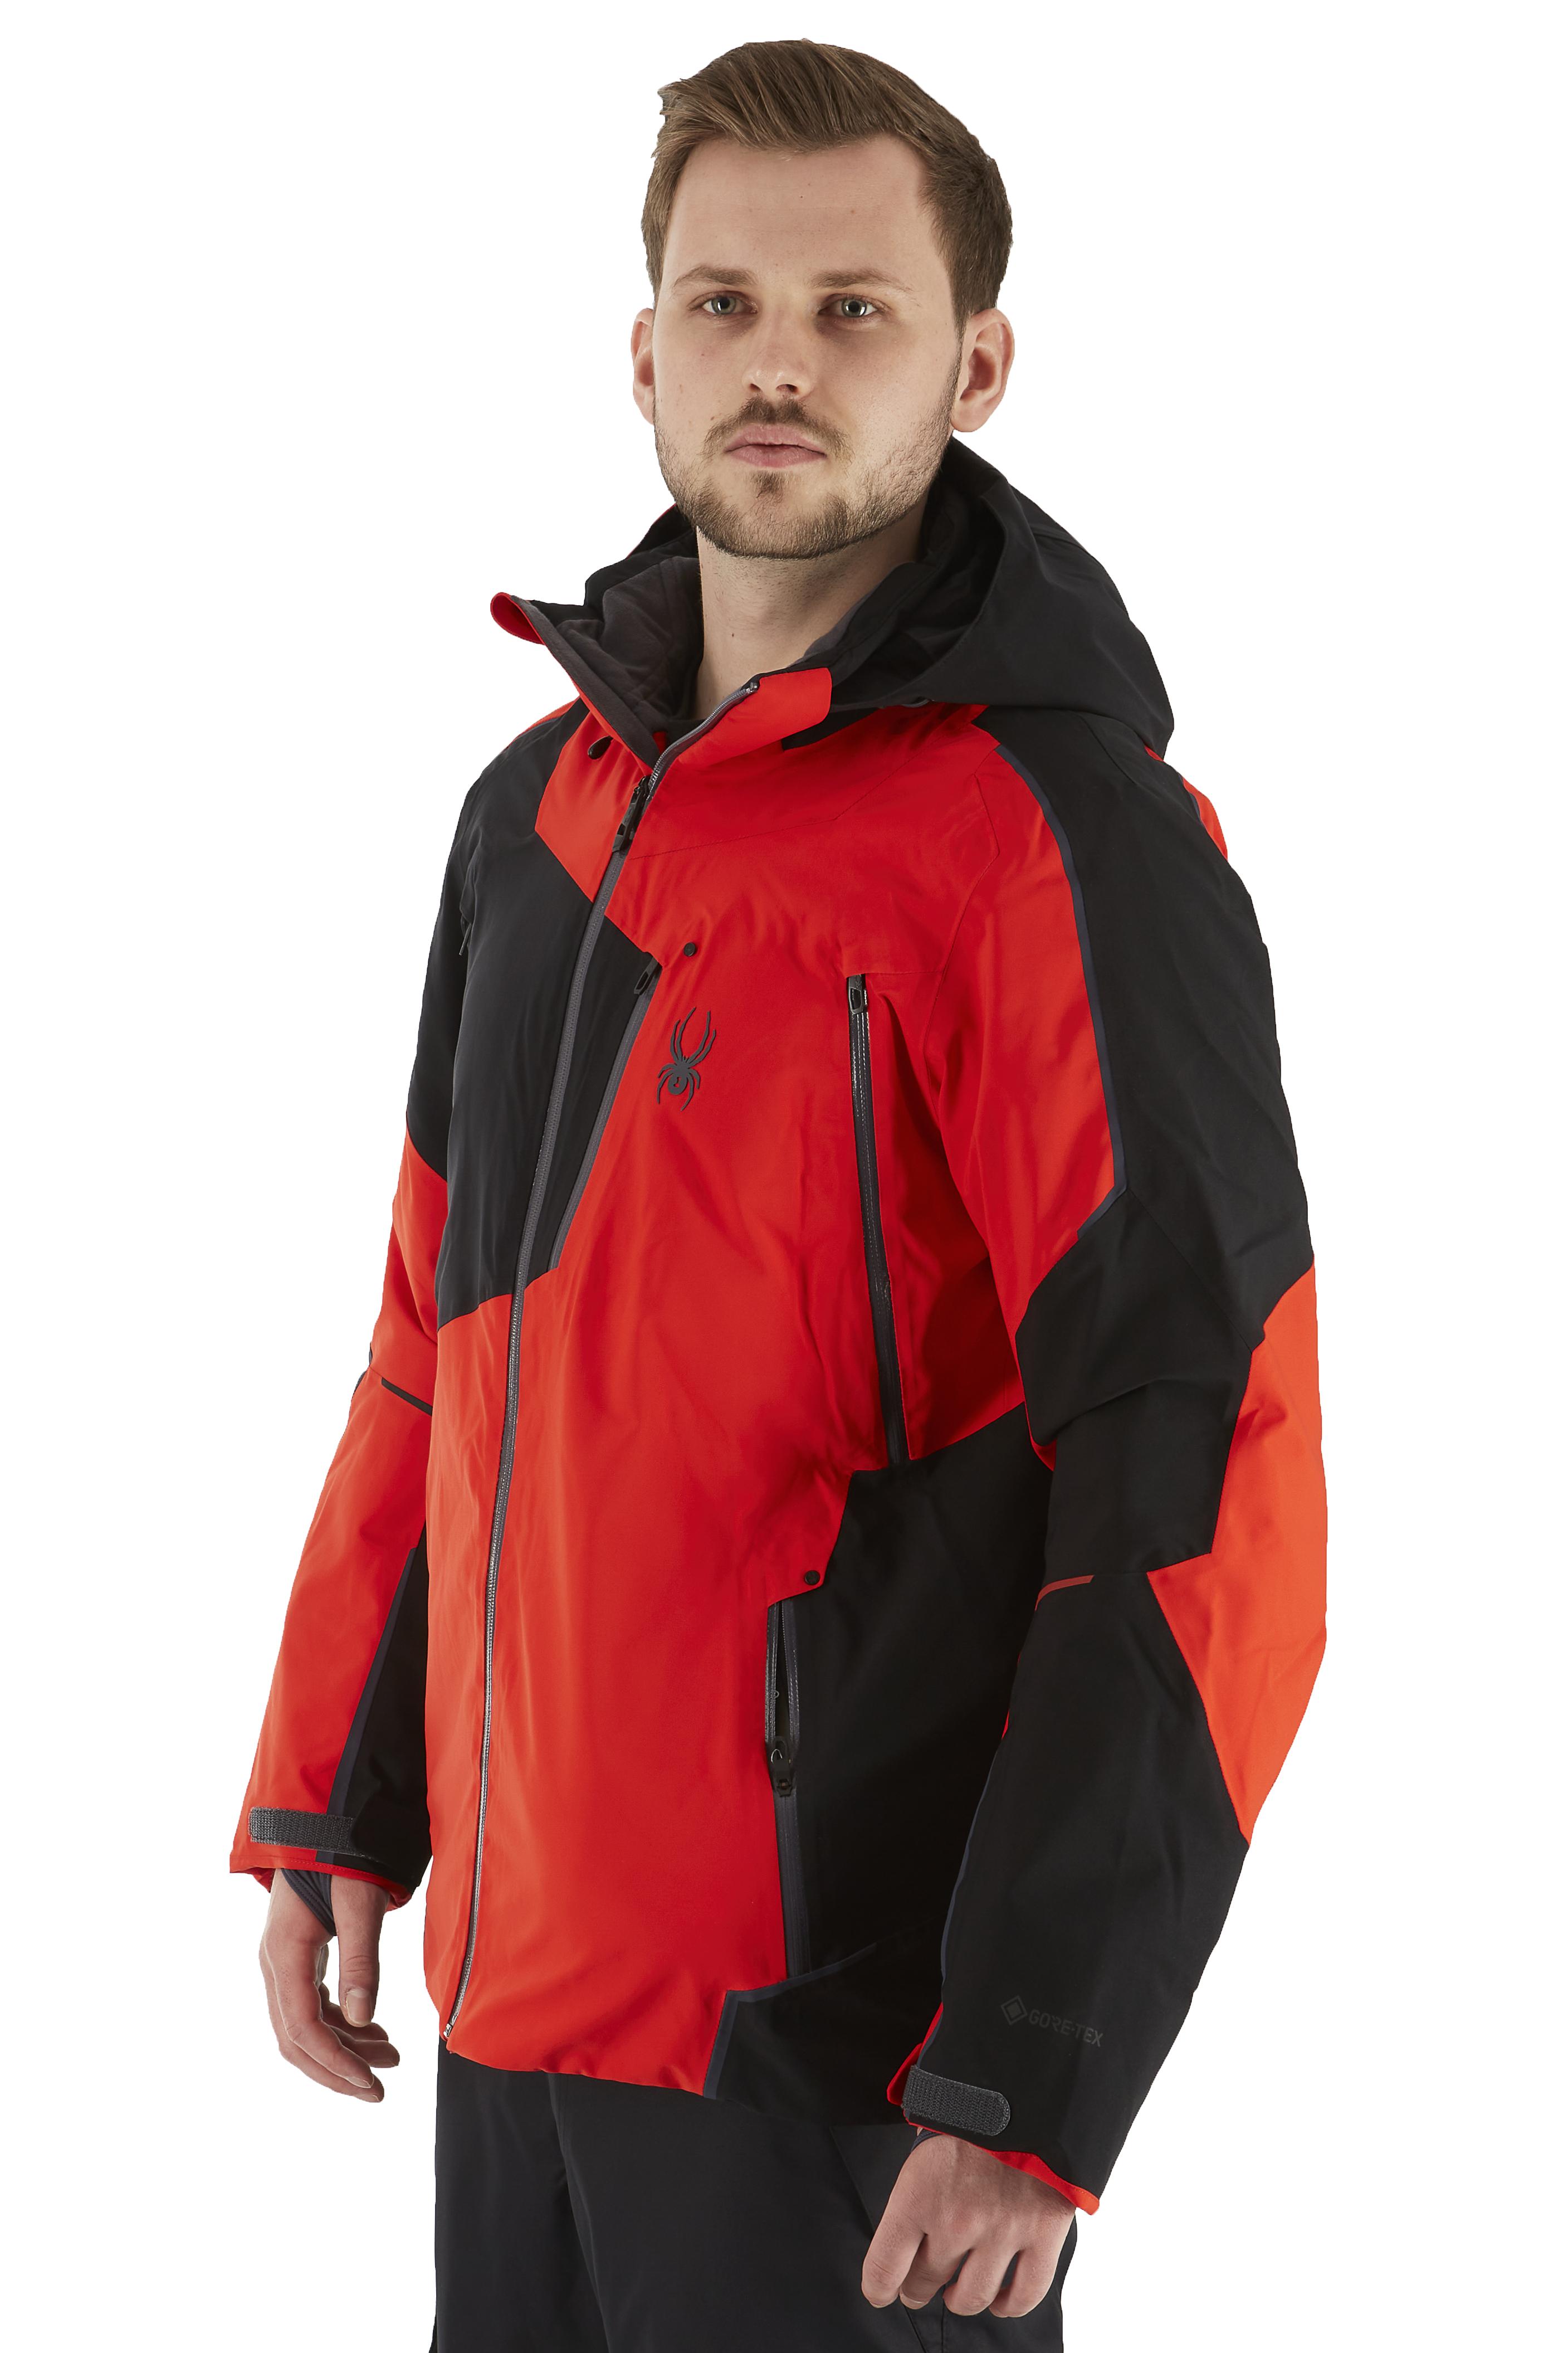 Spyder Leader GTX Ski/Snowboard Jacket, L Bright Red